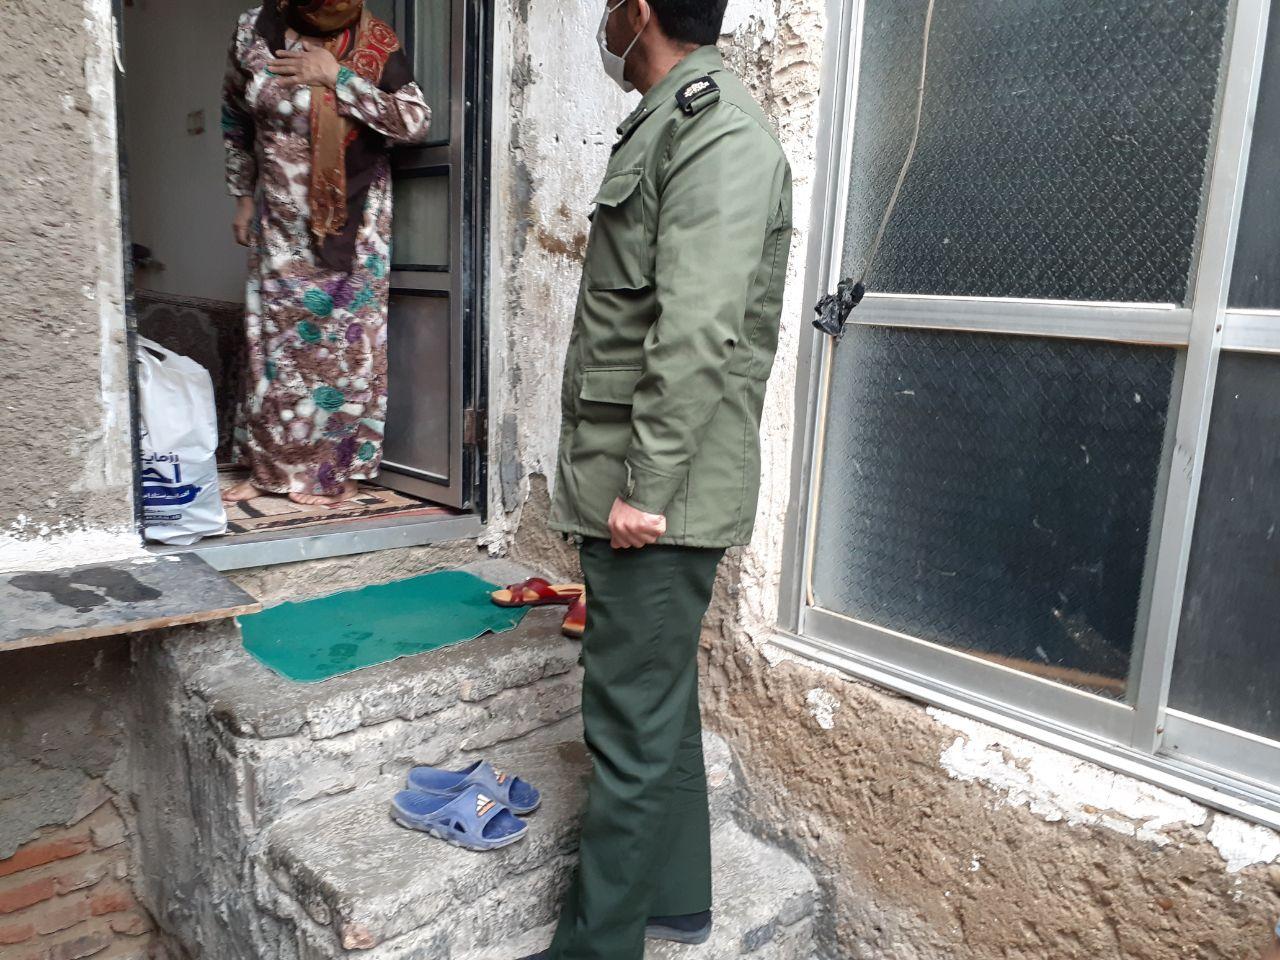 IMG 20201225 142859 050 - ۳۰ بسته معیستی به همت کانون امام علی(ع) نکا بین نیازمندان توزیع شد